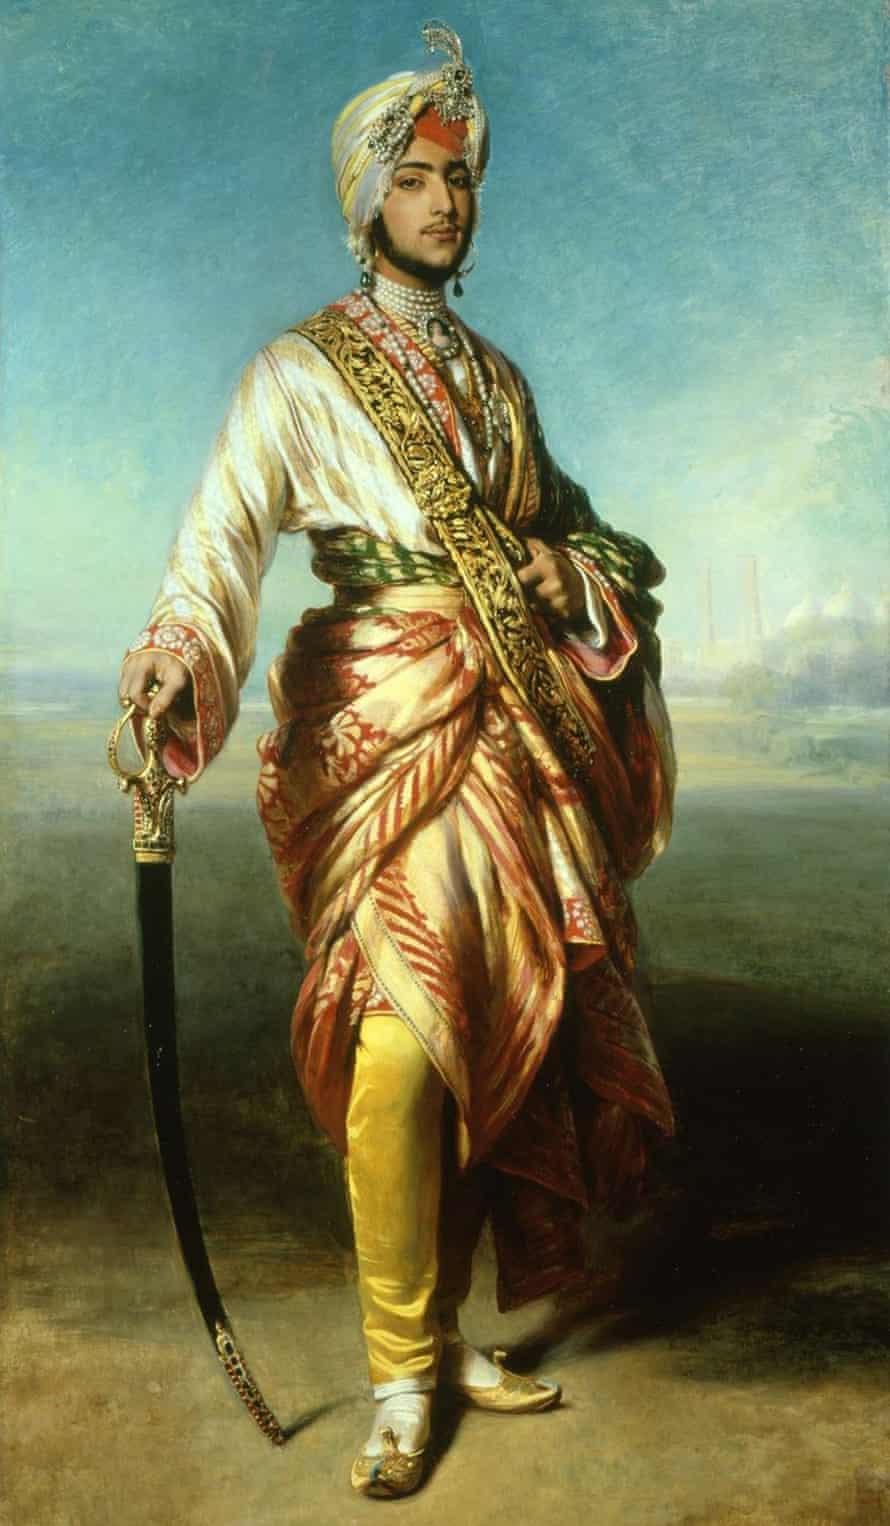 The Maharajah Duleep Singh by Franz Xaver Winterhalter